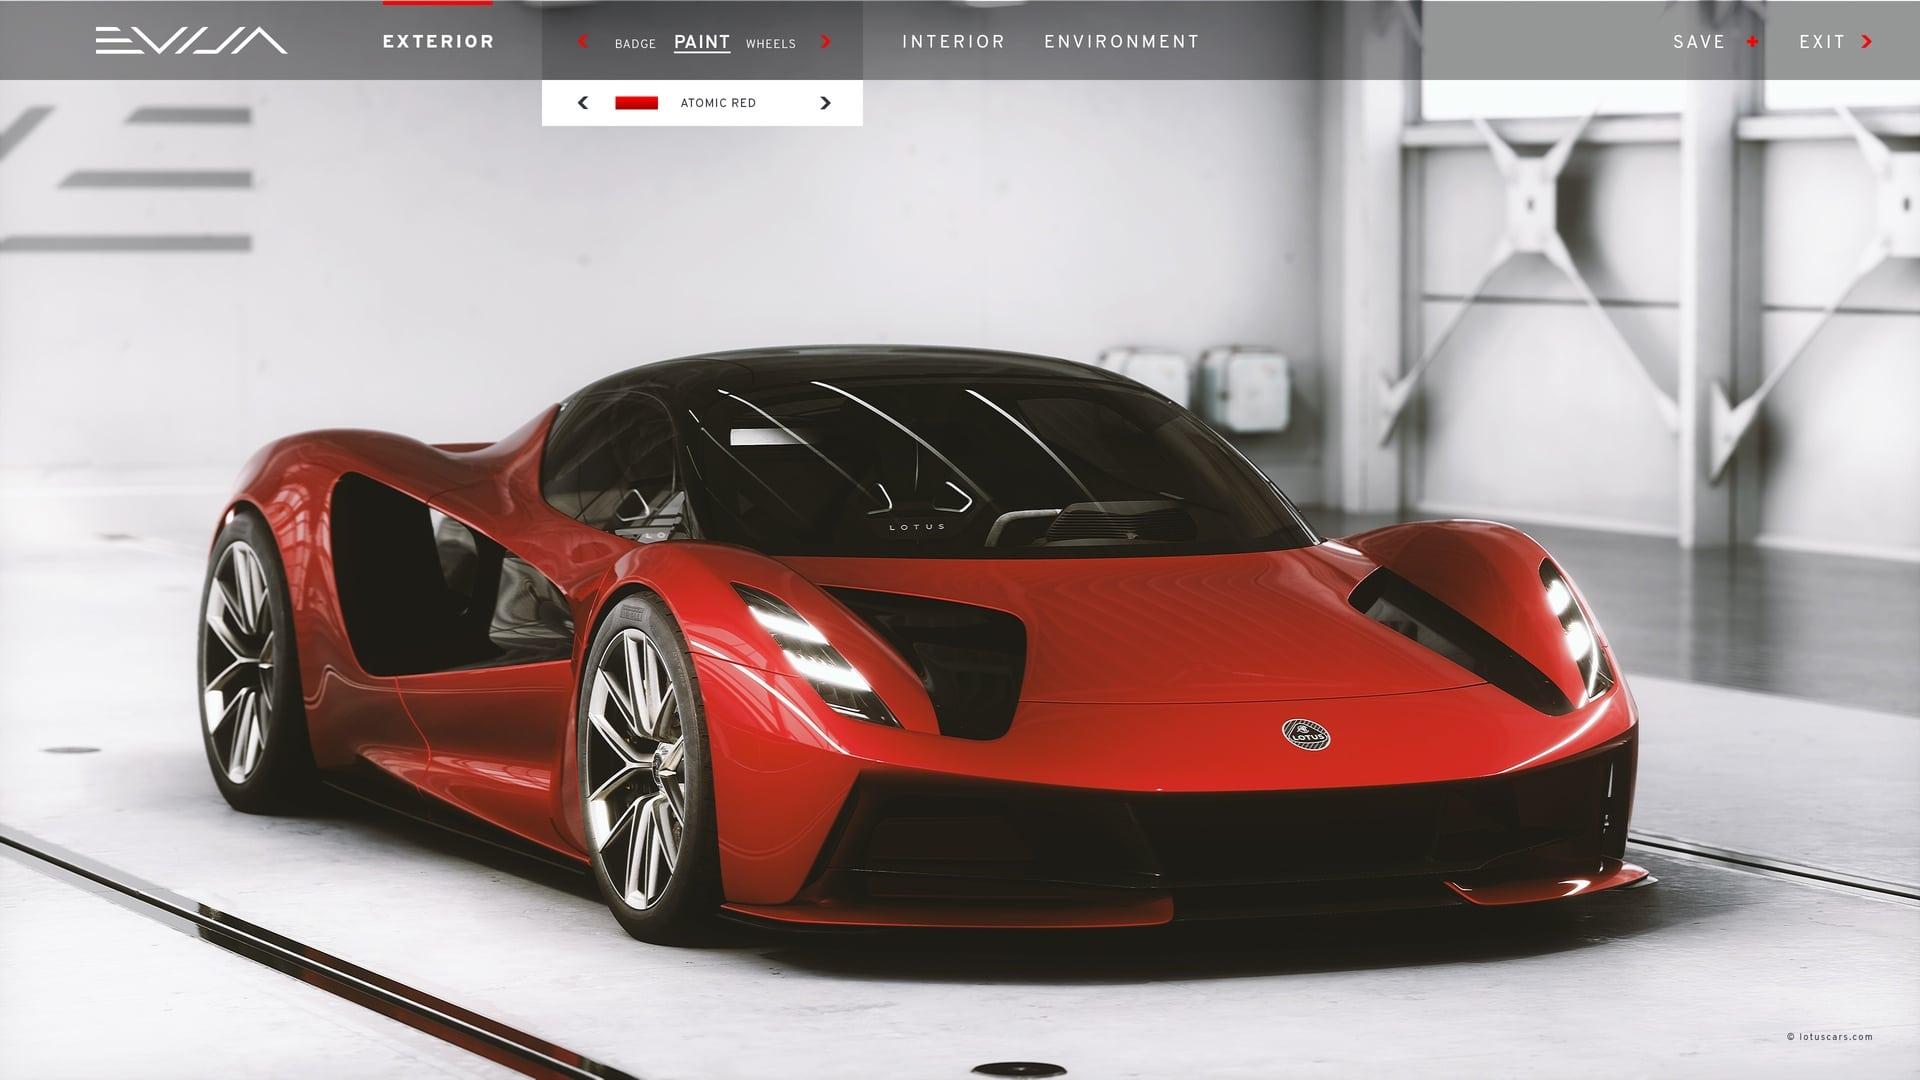 Lotus Evija Configurator: How Would You Design Your Dream Evija?